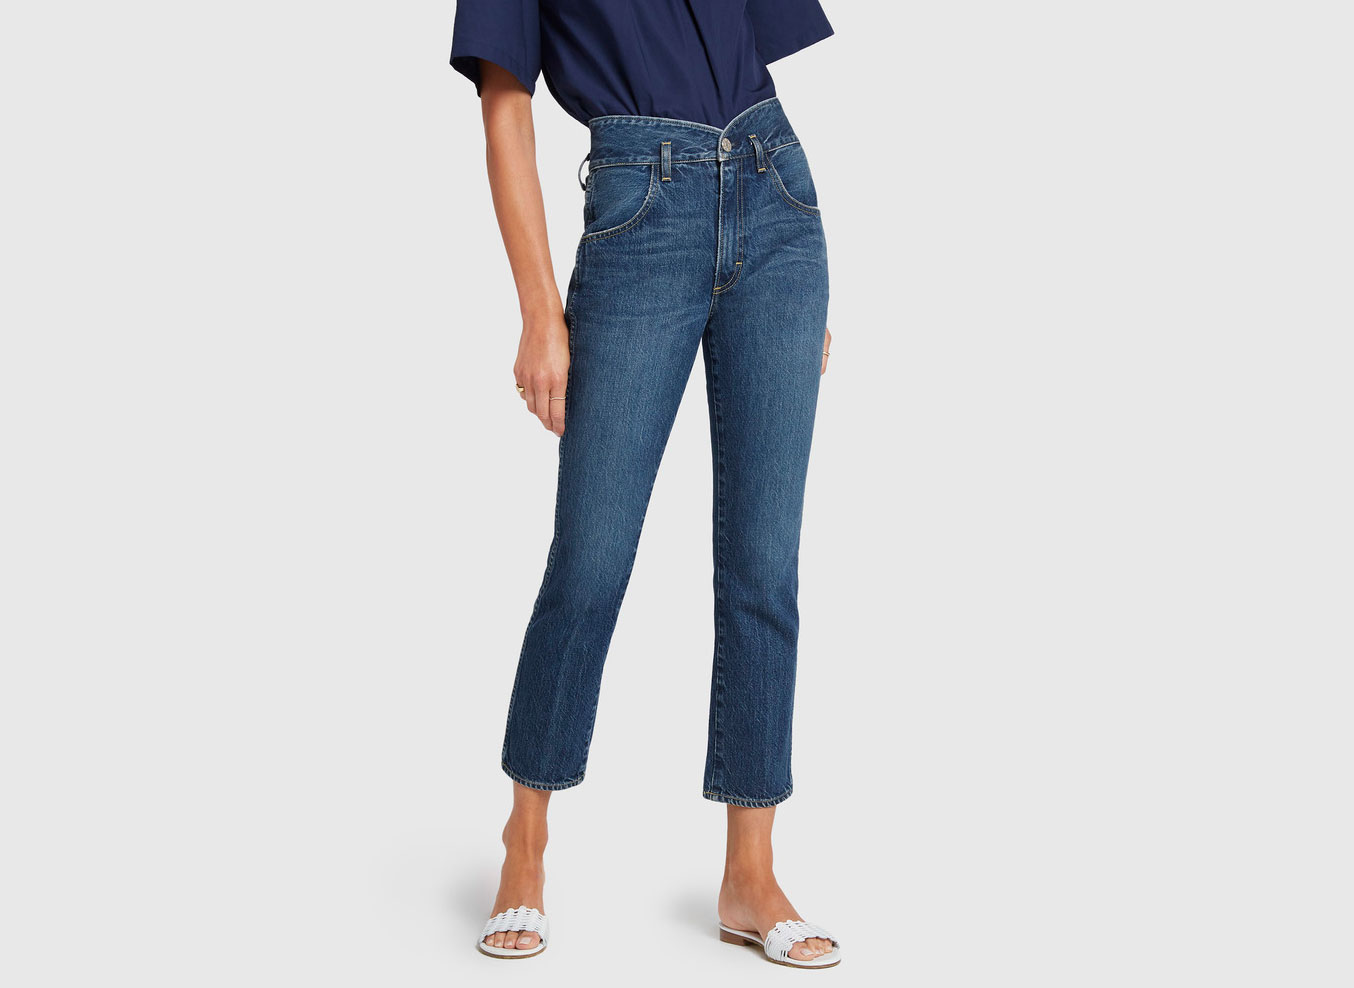 AMO Tulip High Rise Slim Fit Jeans